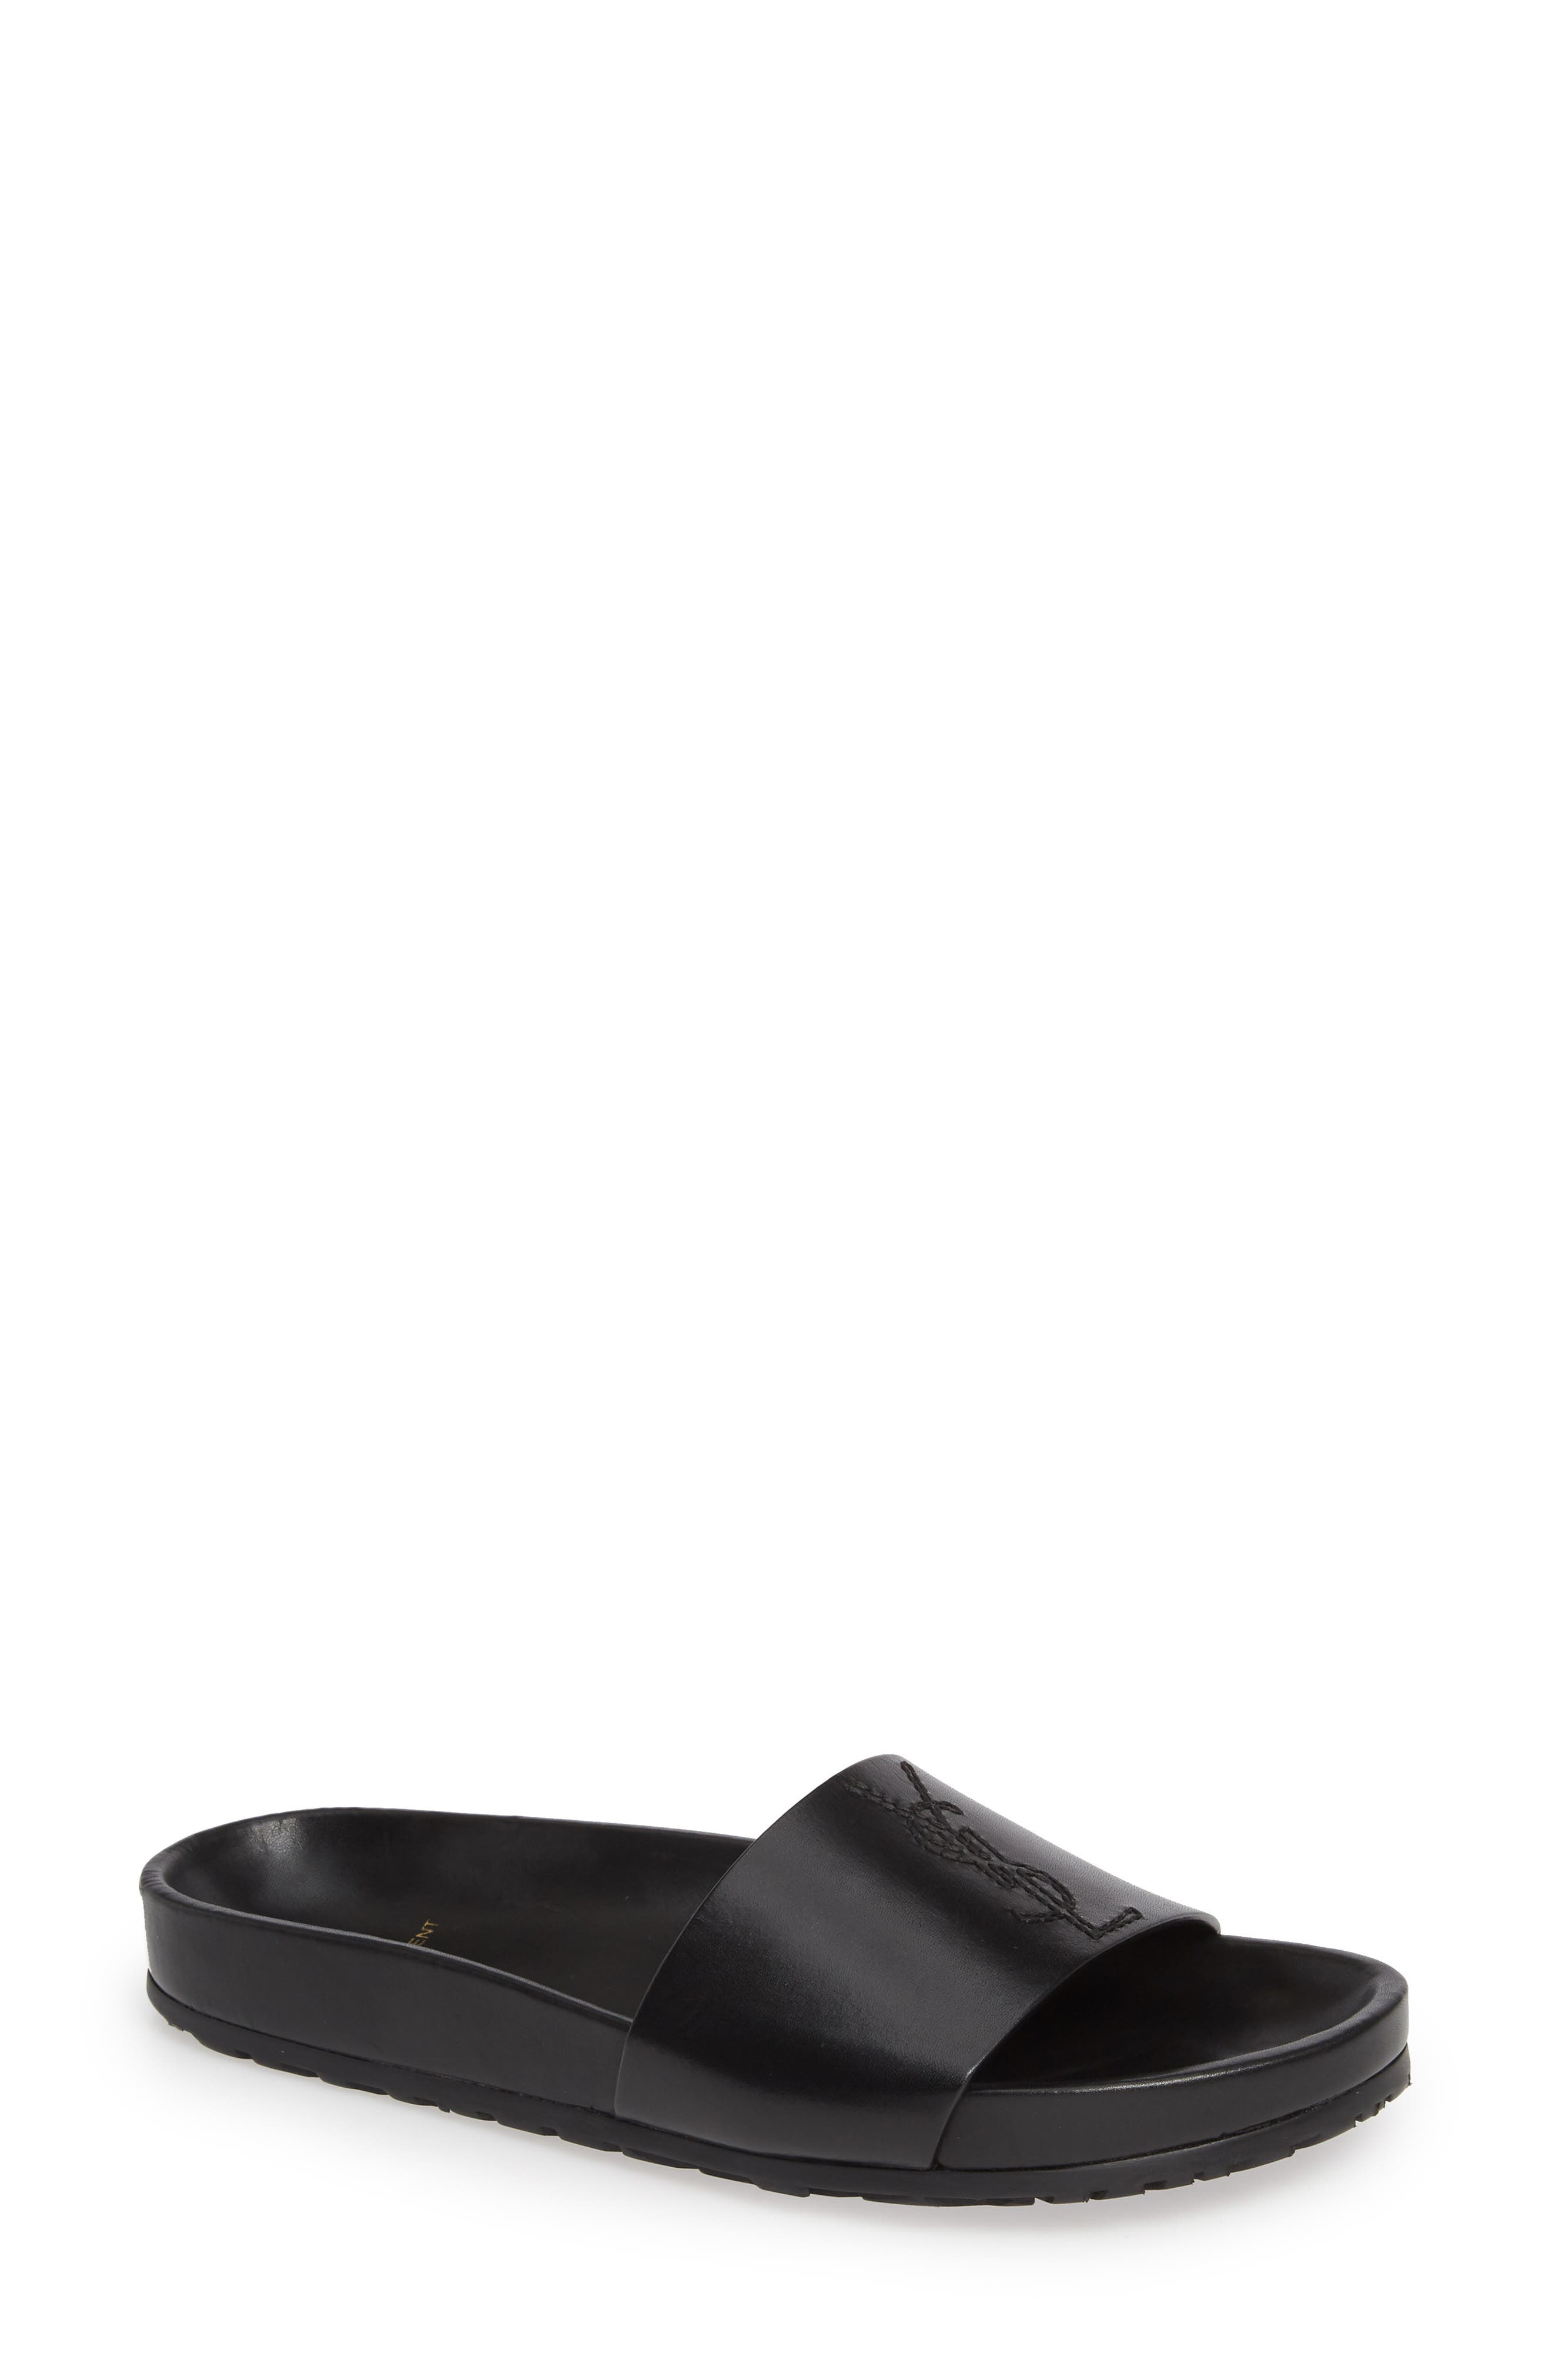 SAINT LAURENT Jimmy Logo Slide Sandal, Main, color, BLACK LEATHER